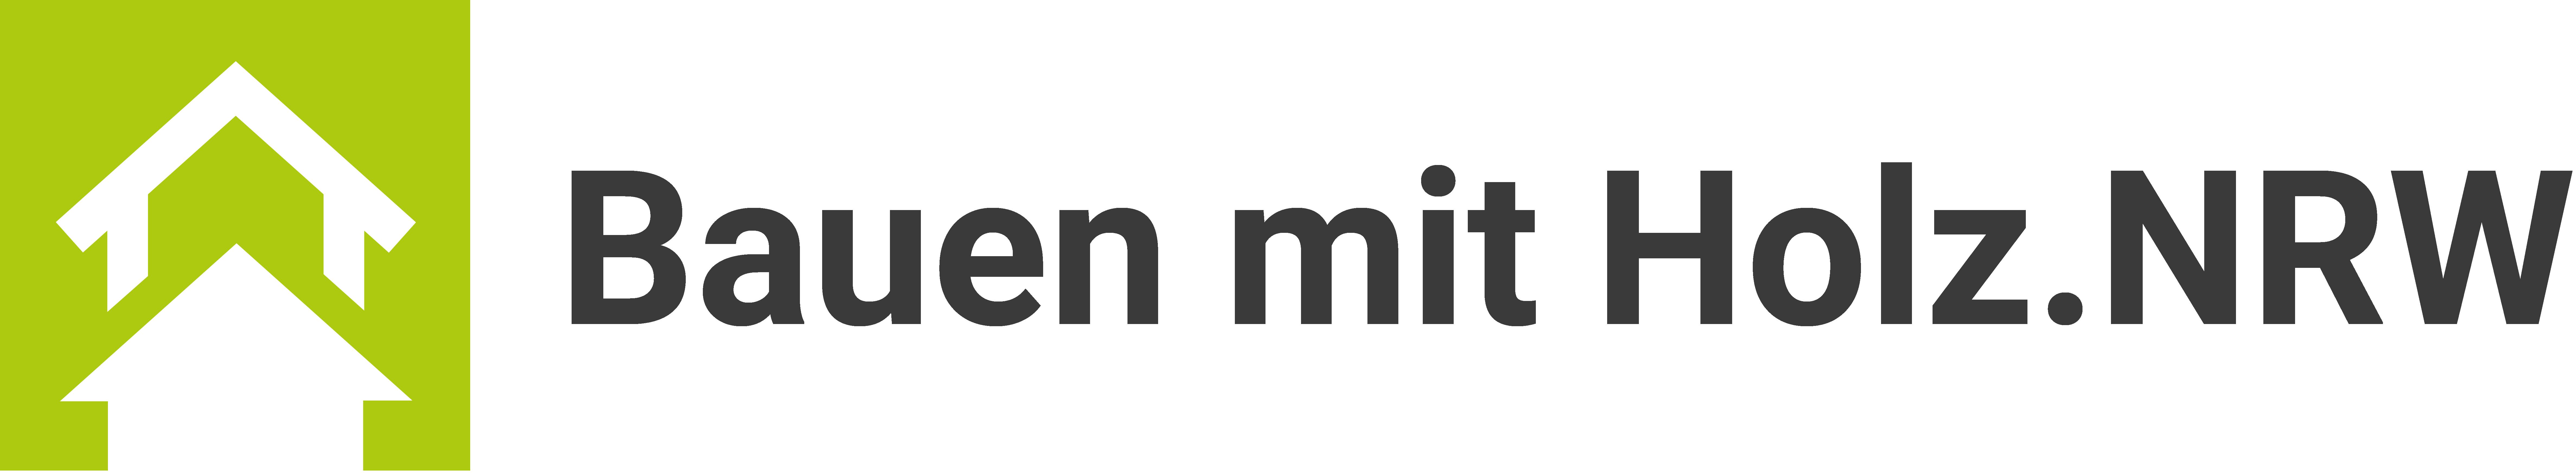 bmh-nrw-logo.png